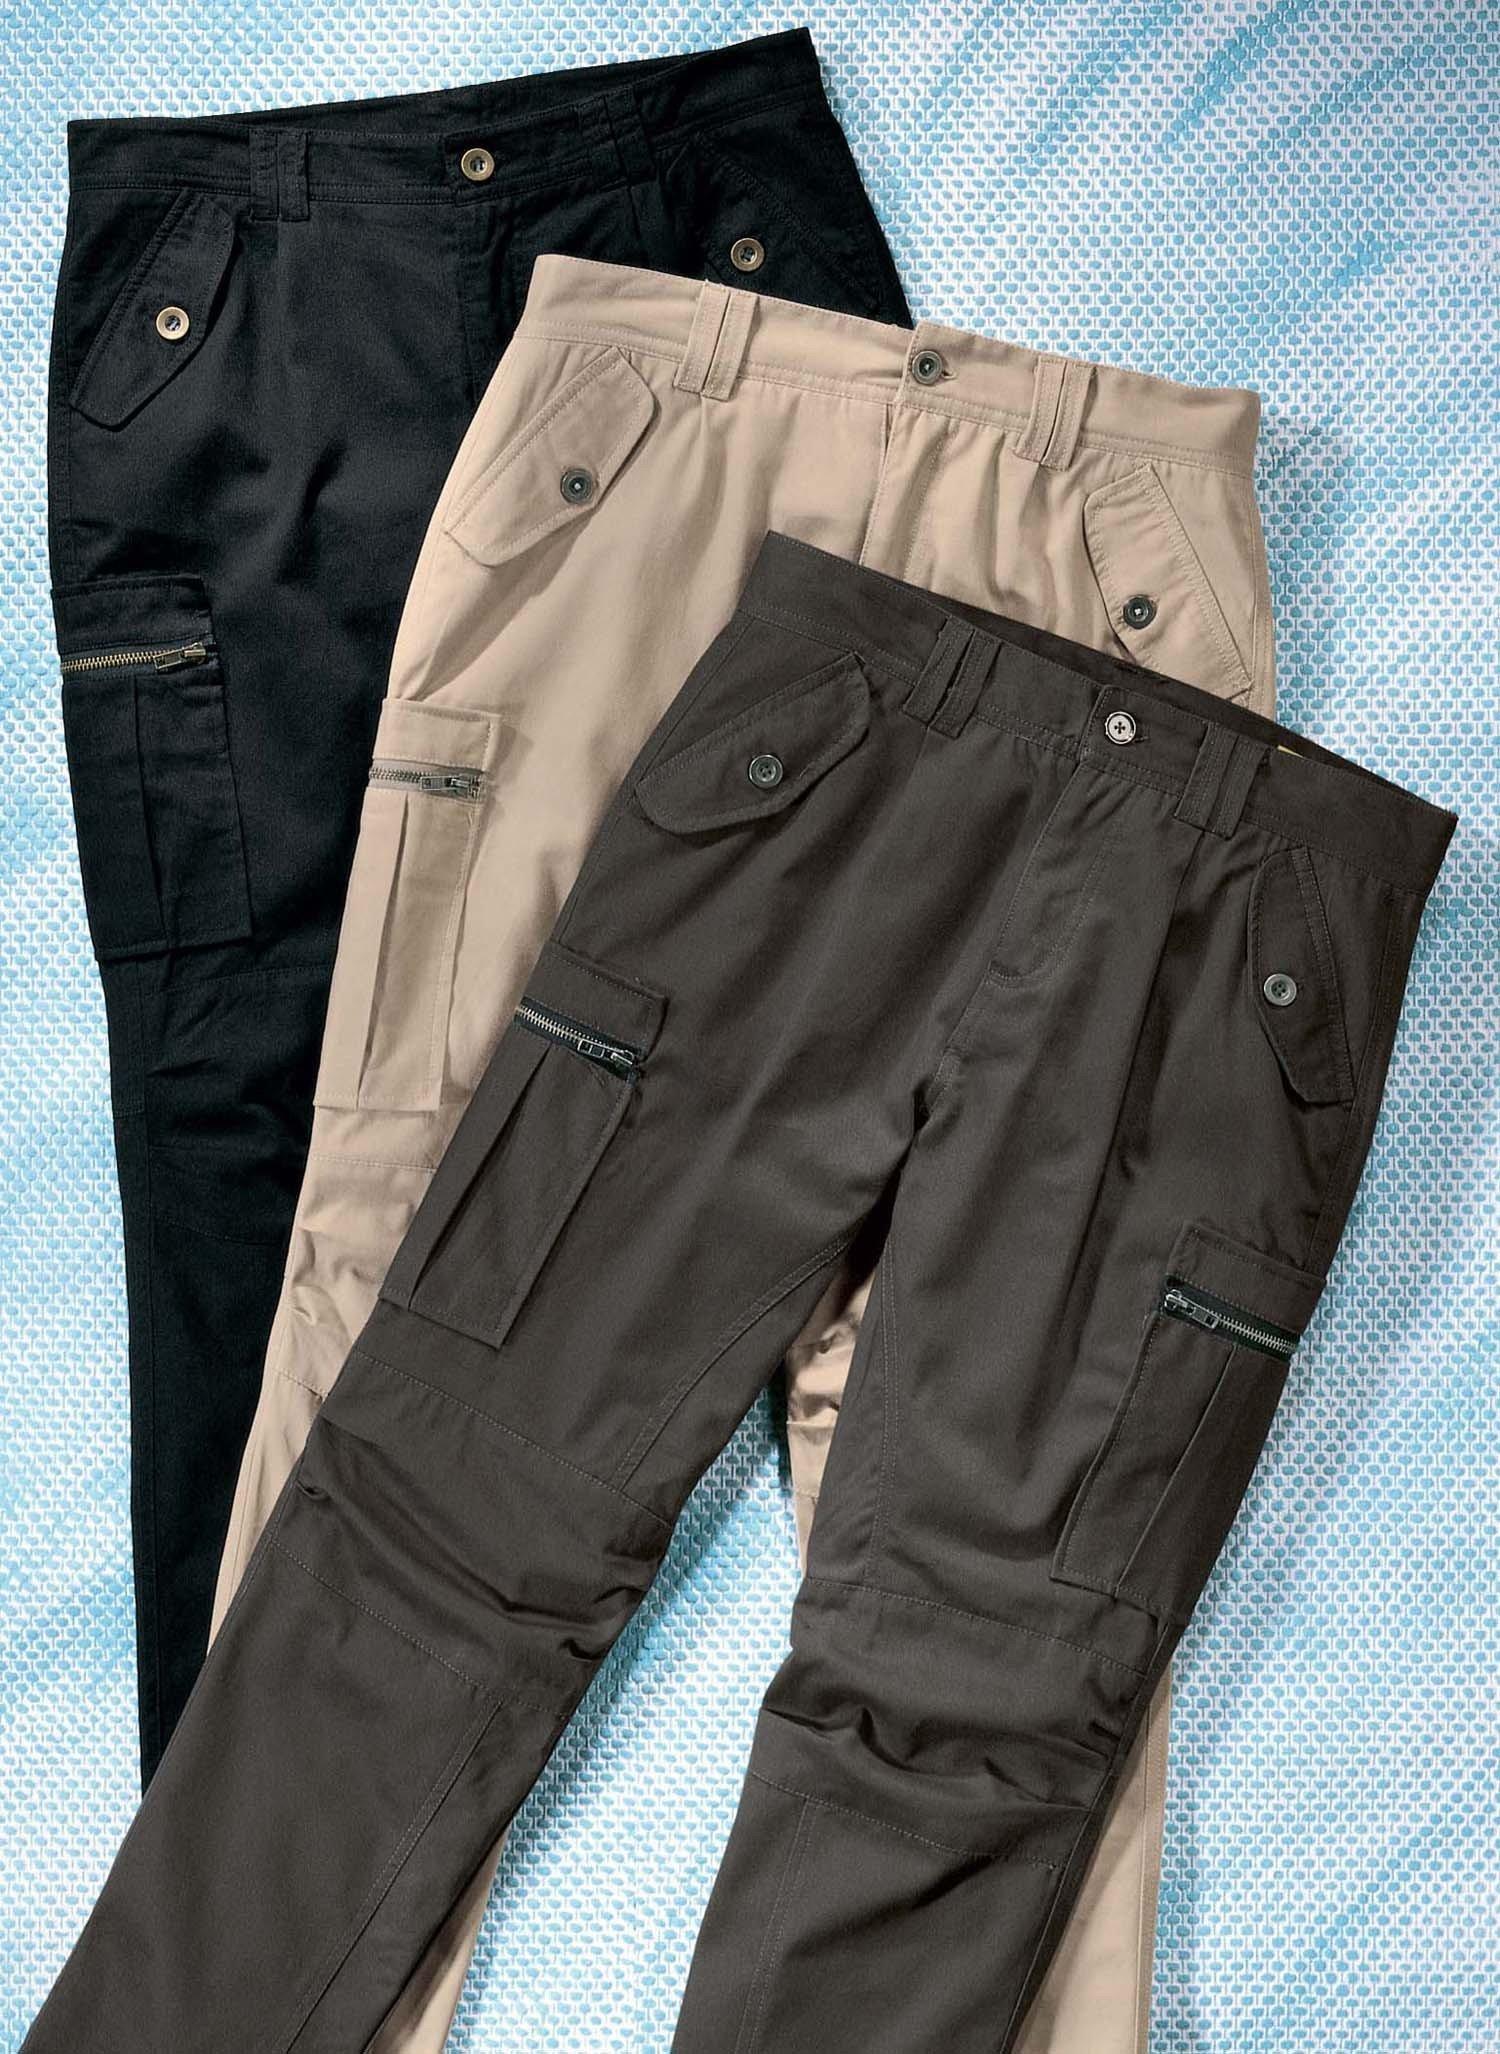 D-Outdoor-Hose,Taschen beige 44 008 - 1 - Ronja.ch